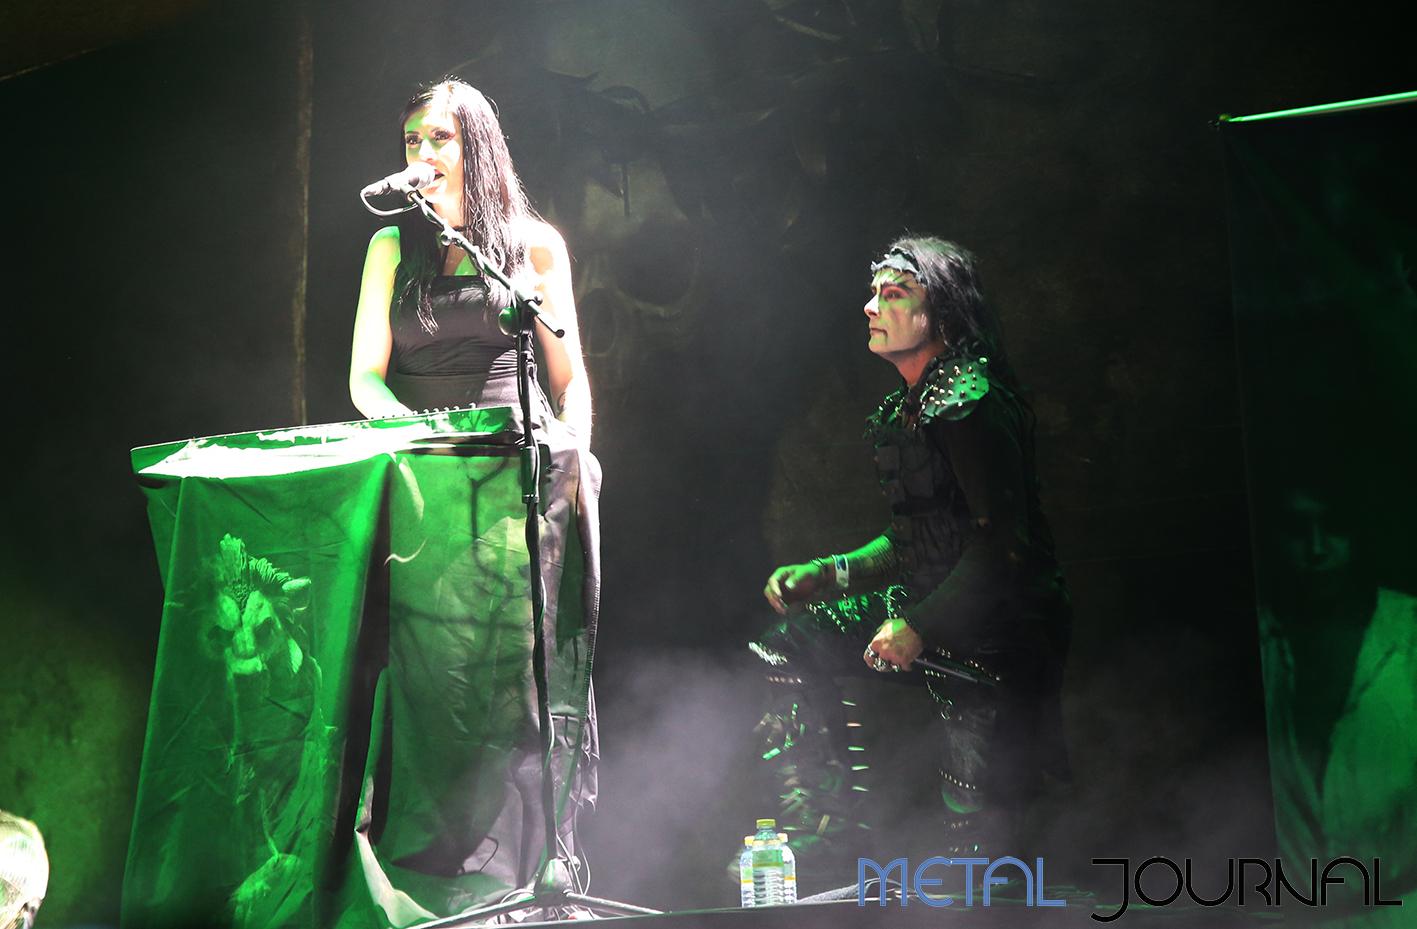 cradle of filth - leyendas del rock 2019 metal journal pic 4